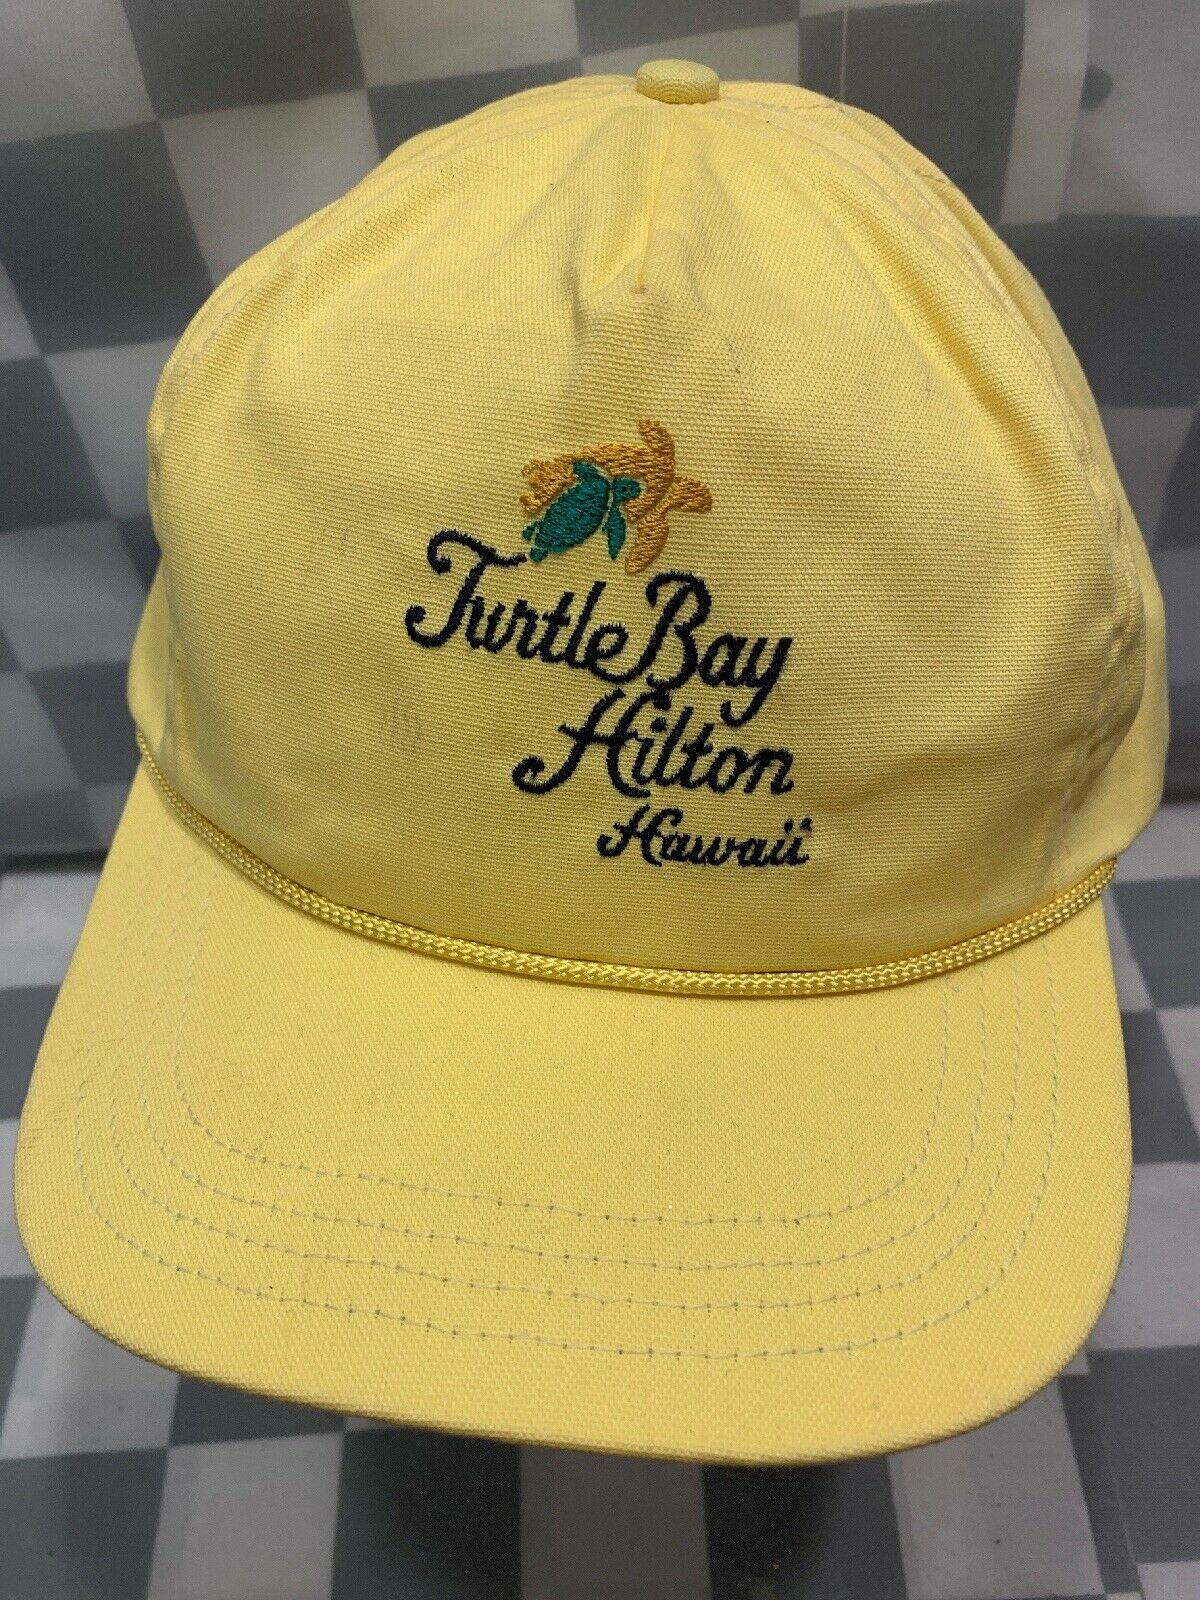 TURTLE BAY HILTON Hawaii Vinateg Made in USA Adjustable Adult Cap Hat